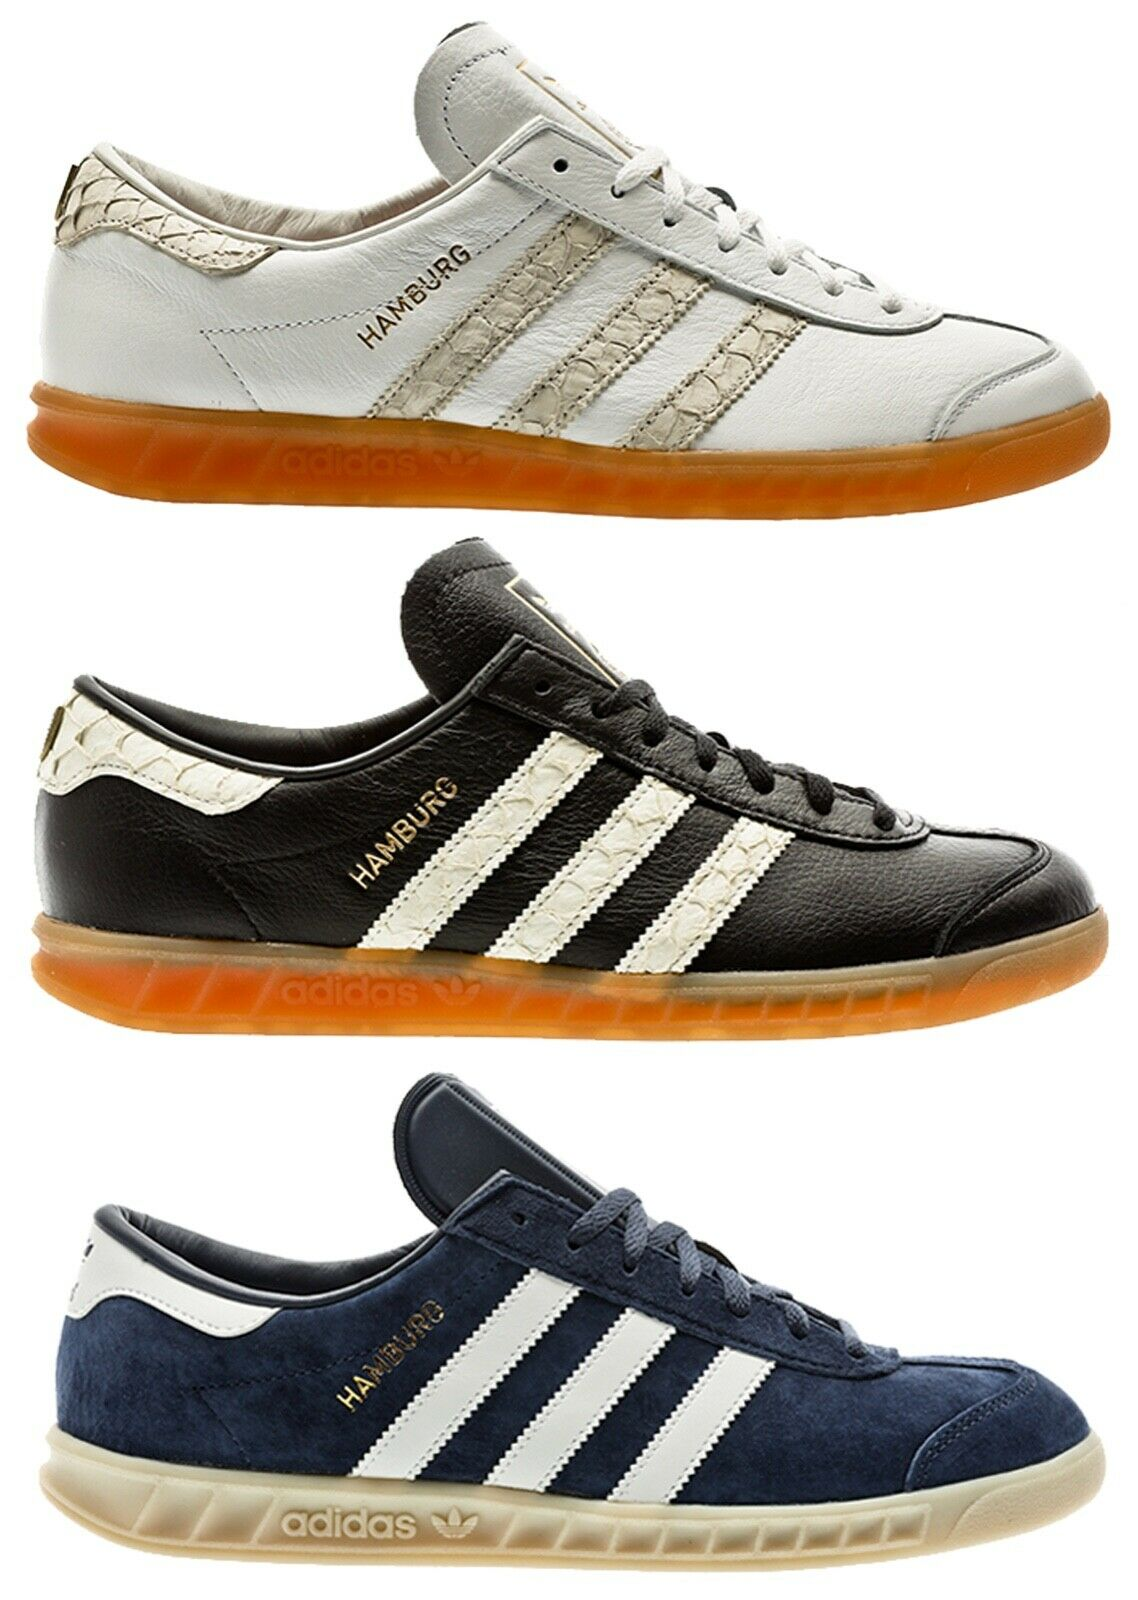 Adidas Originals Hamburg Men Sneaker Men's Shoes Shoe Trainers